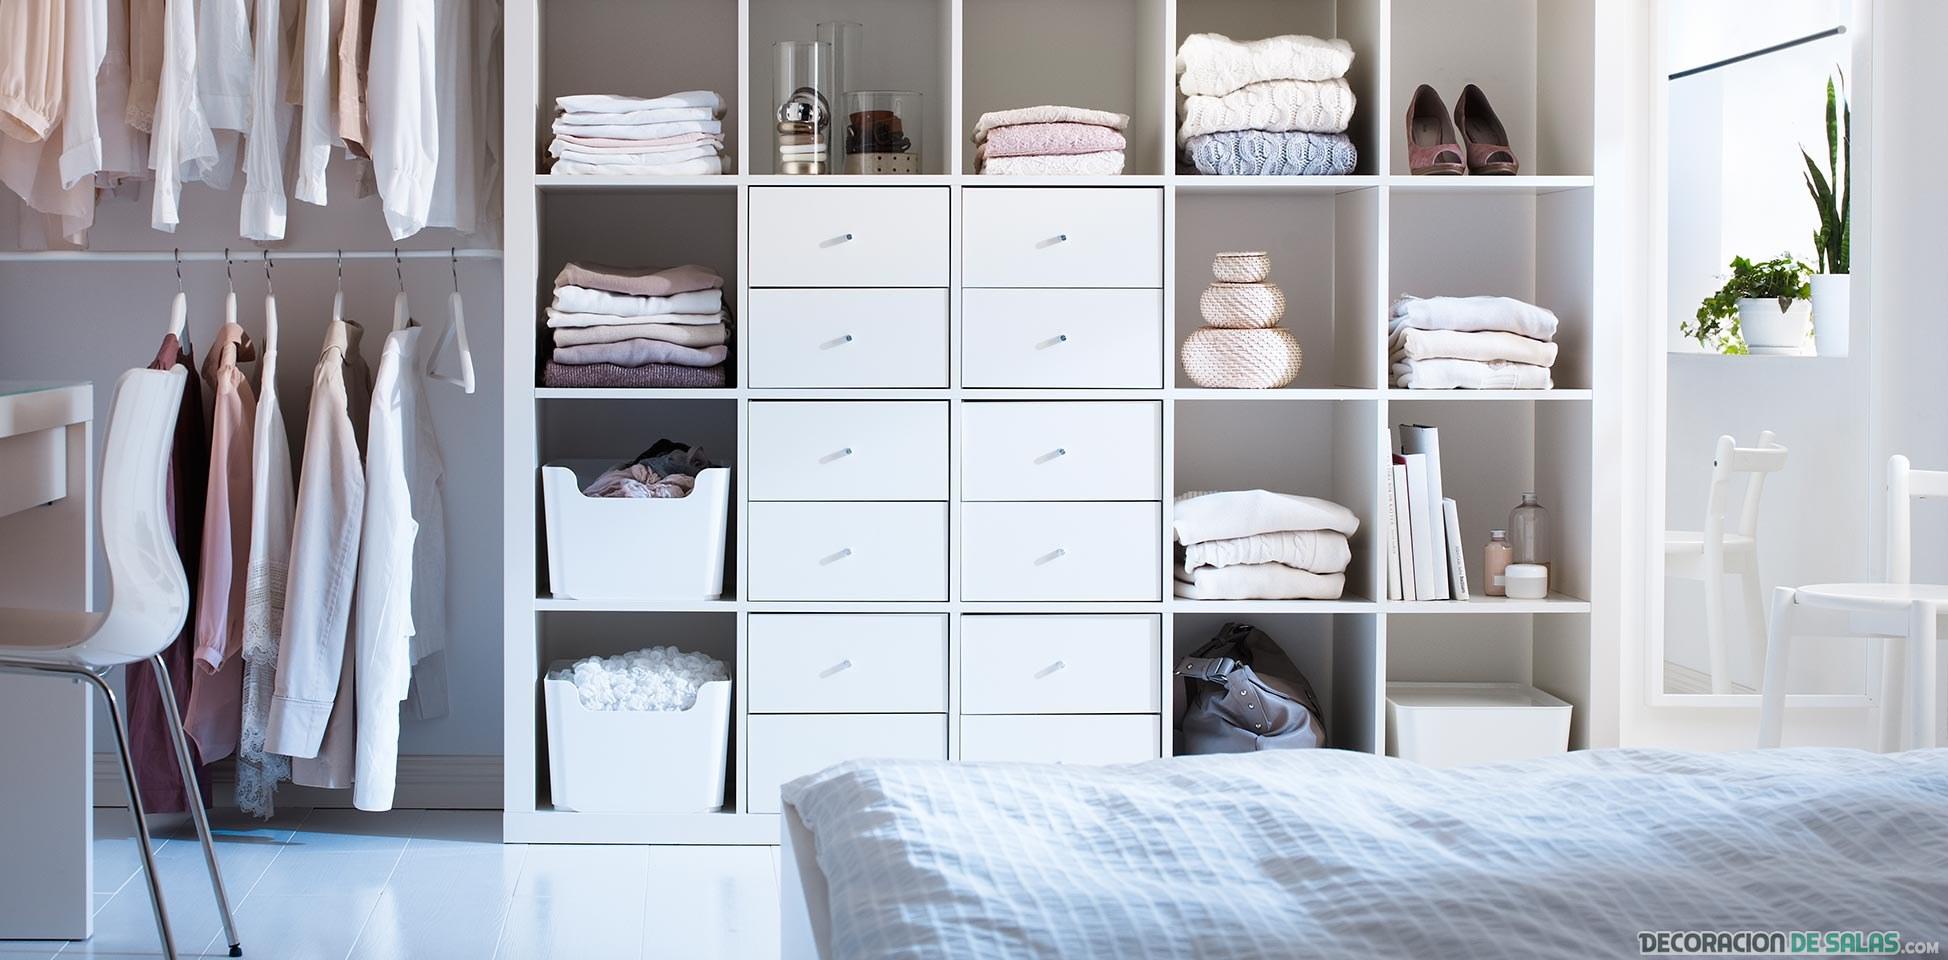 estanterías abiertas como vestidor